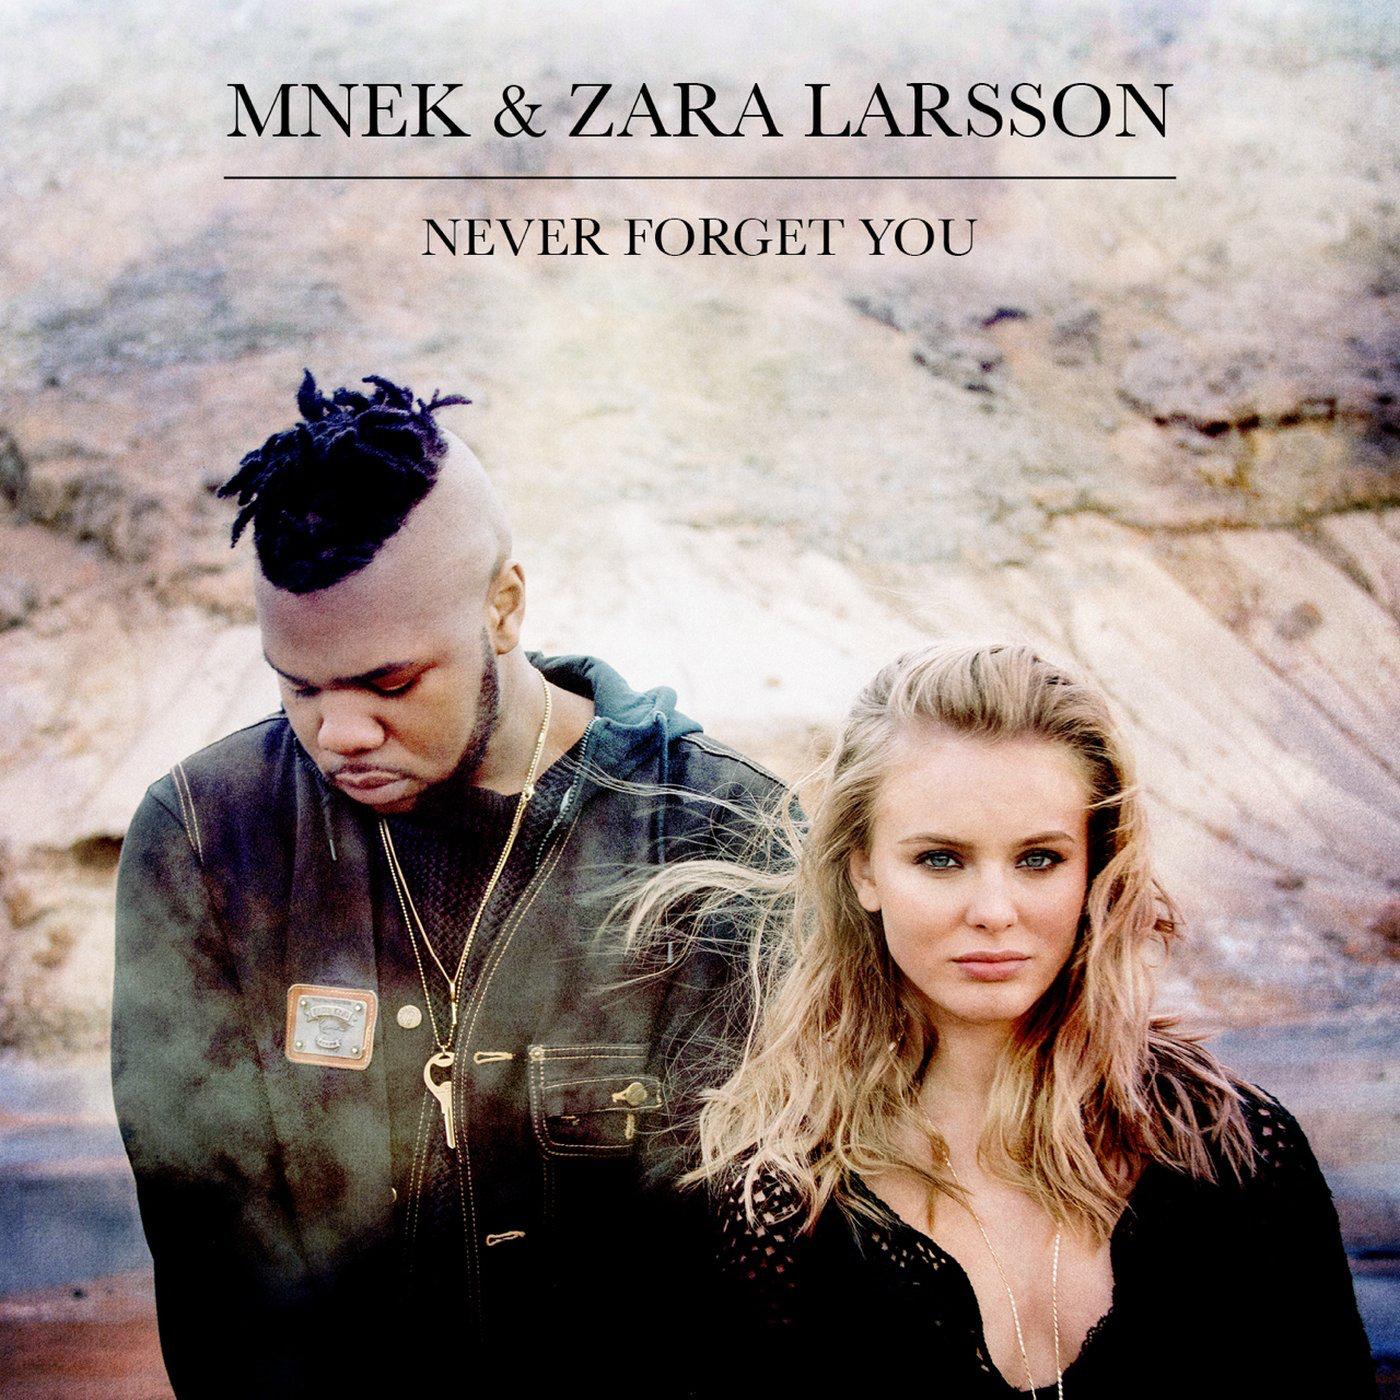 Mnek zara larsson never forget you